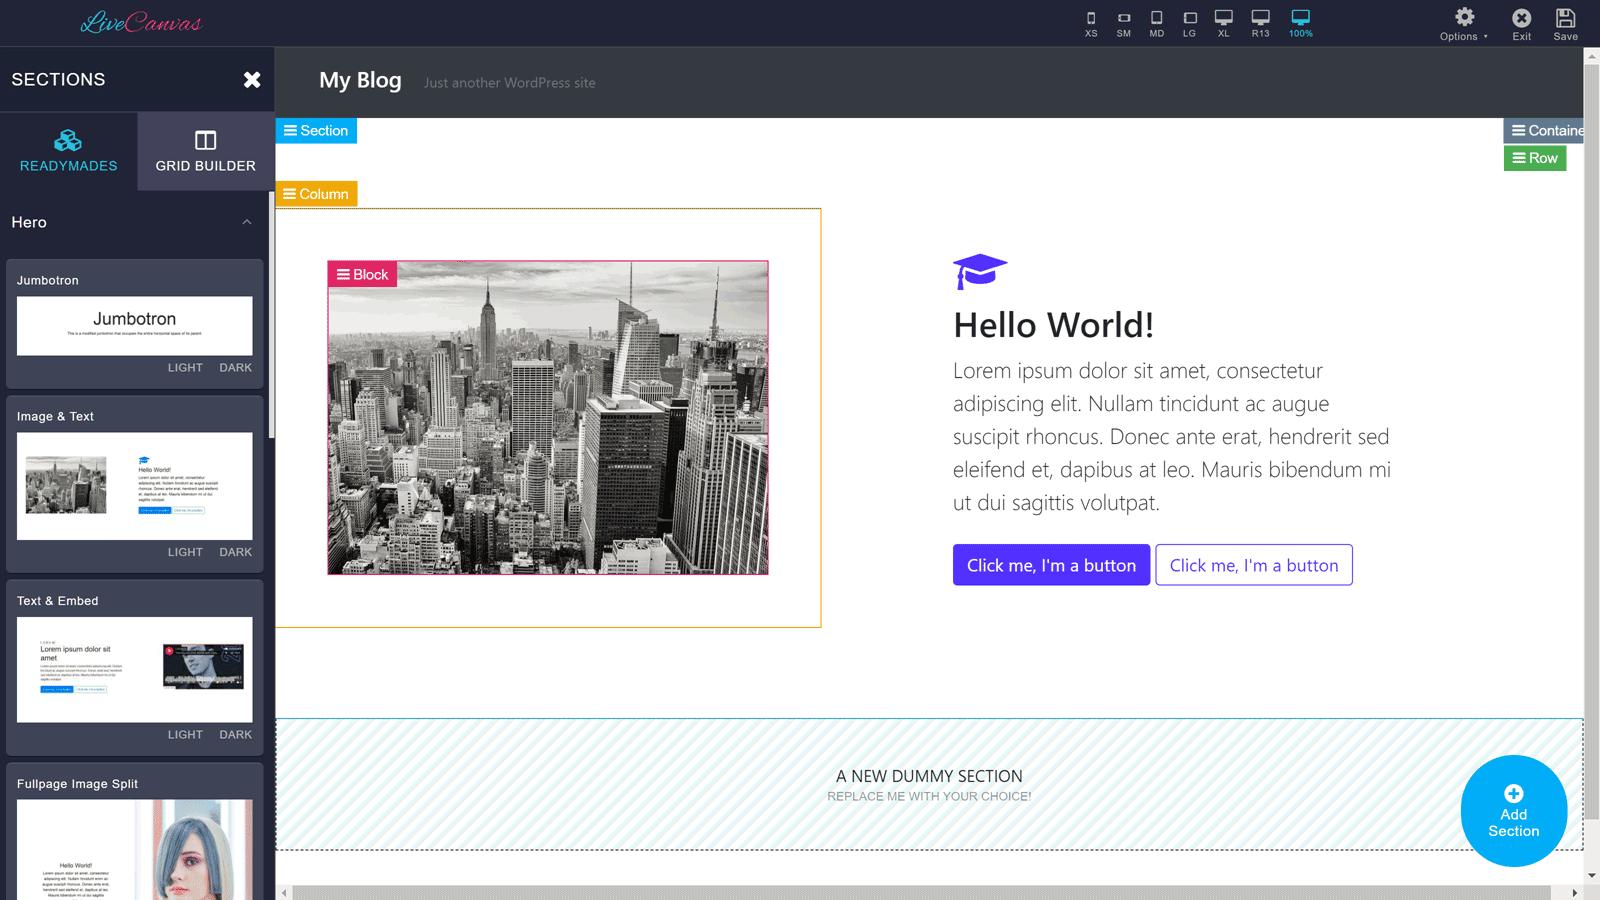 LiveCanvas New Section